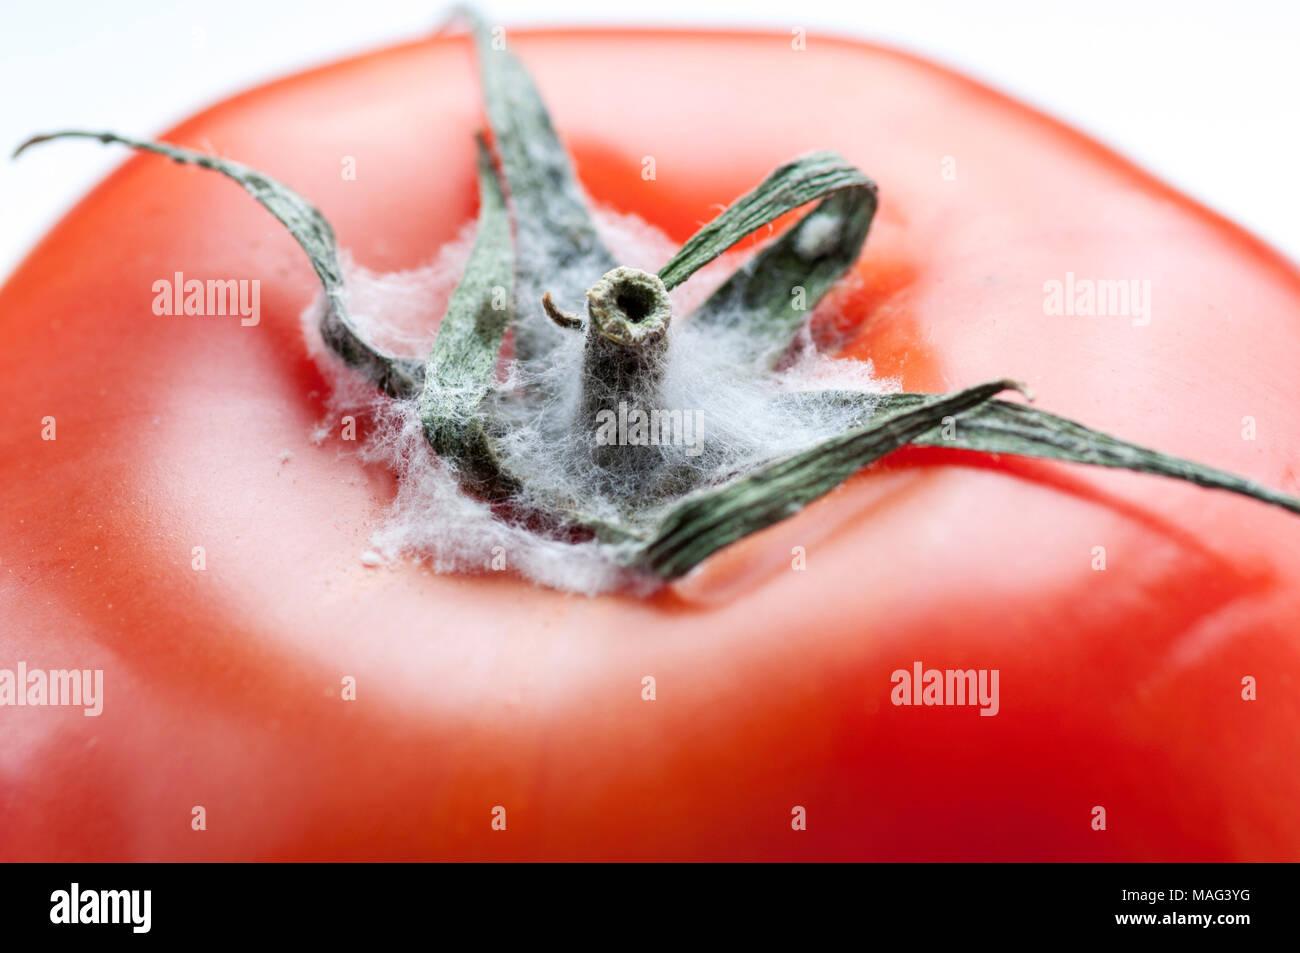 Close-up of Moldy Tomato against White Background - Stock Image